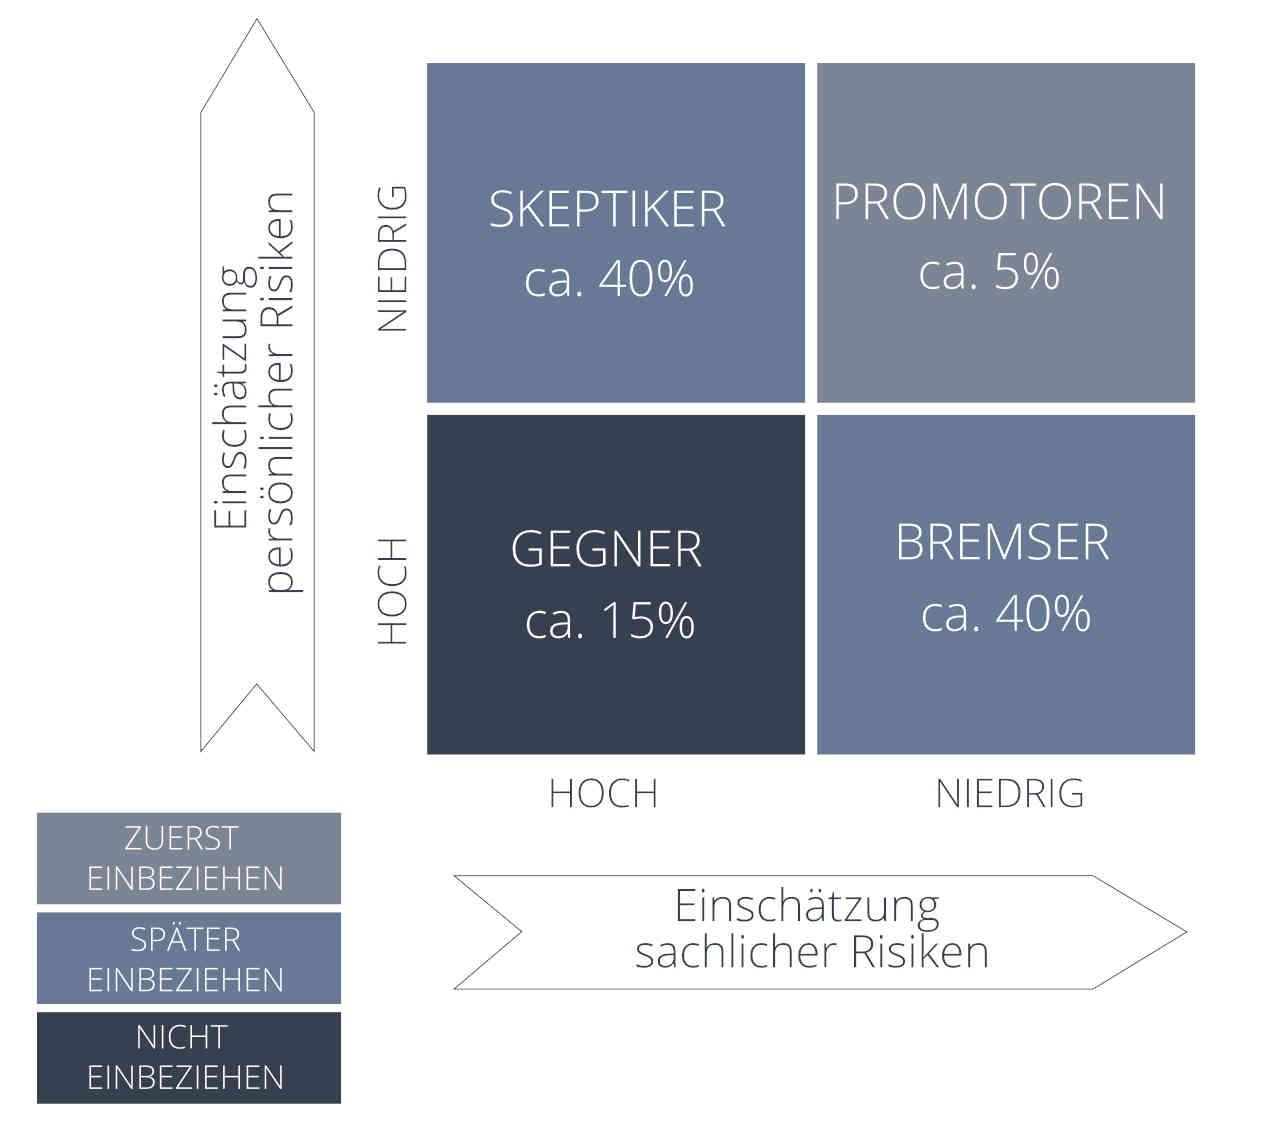 BERIAS Change Management Akzeptanzmatrix